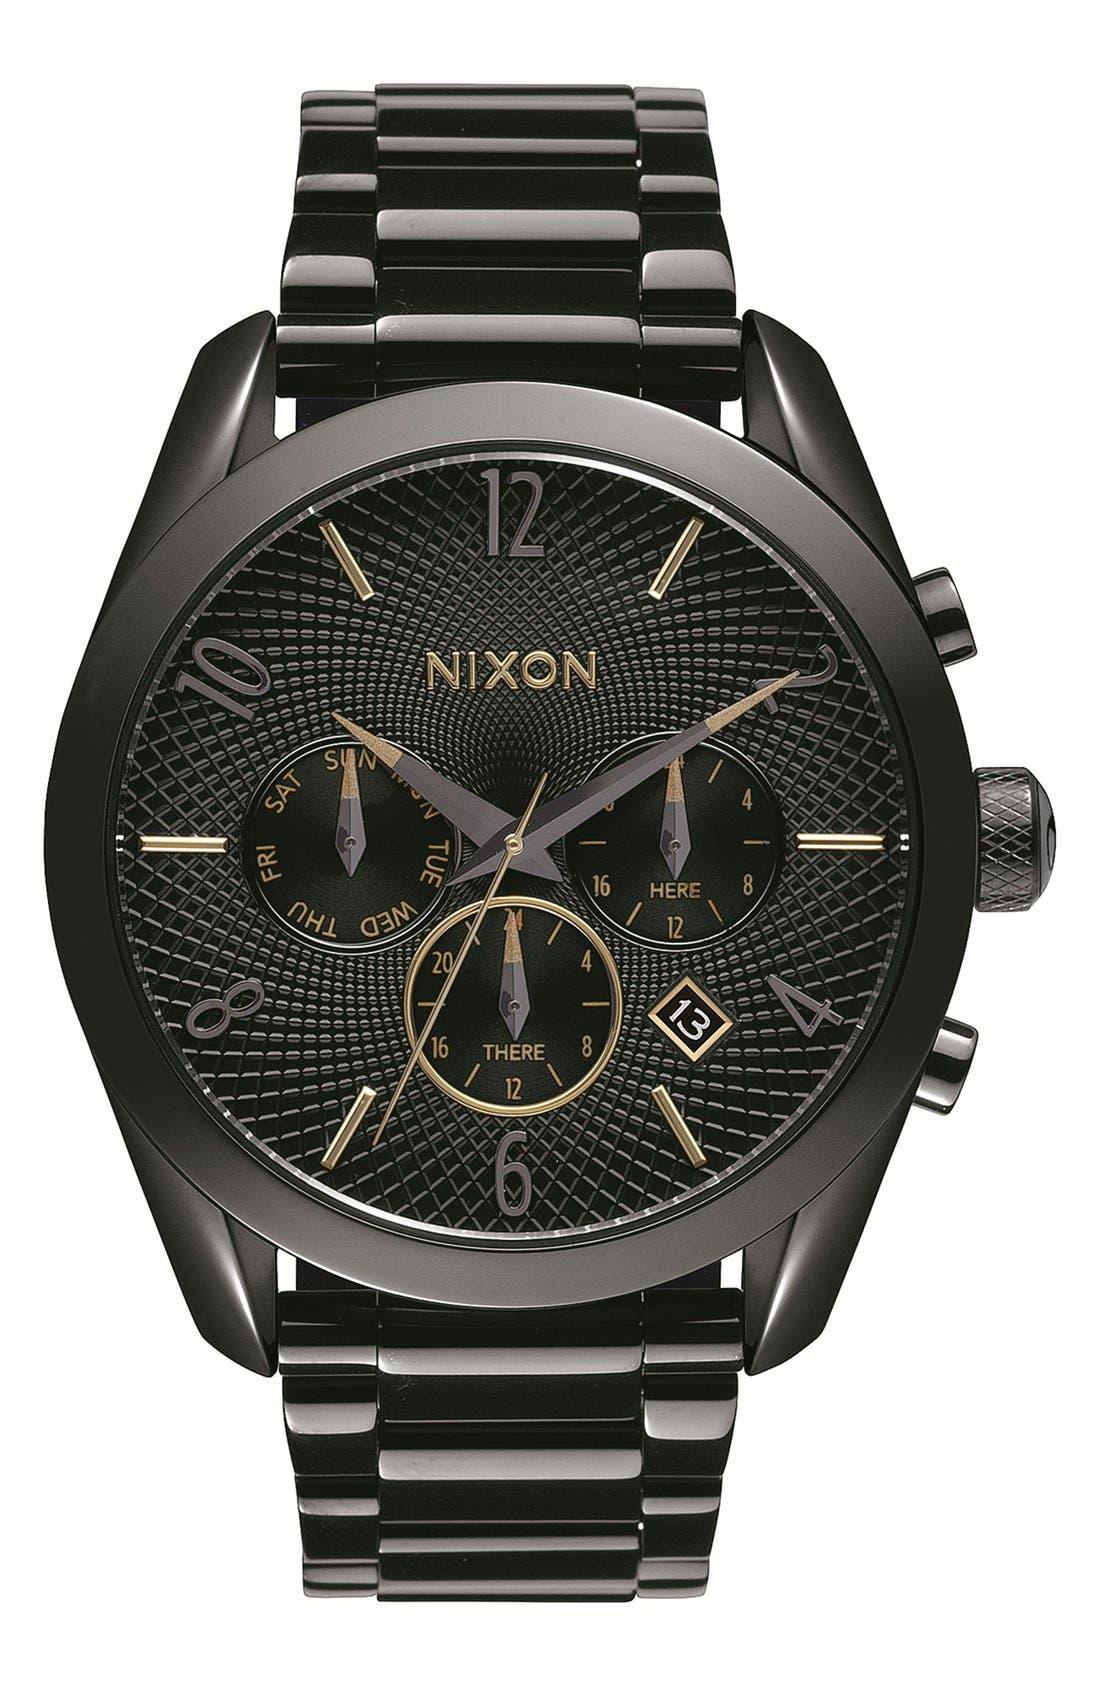 NIXON Bullet Guilloche Chronograph Bracelet Watch, 42mm